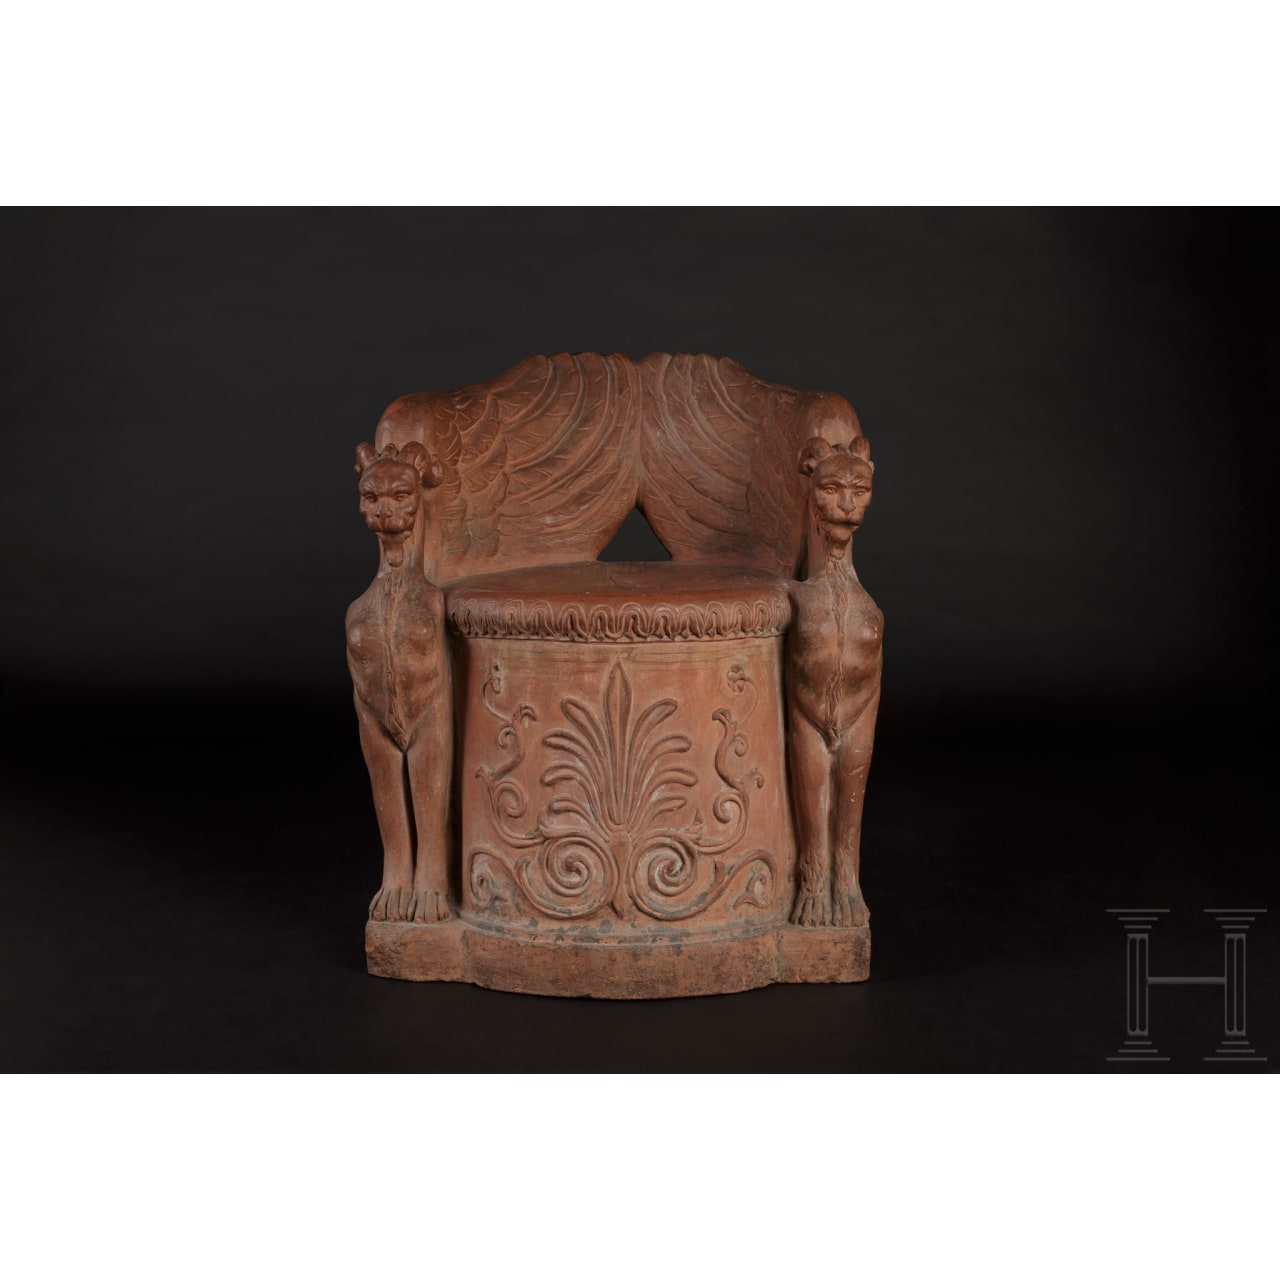 A rare original classicist terracotta-seat, Florence, circa 1800